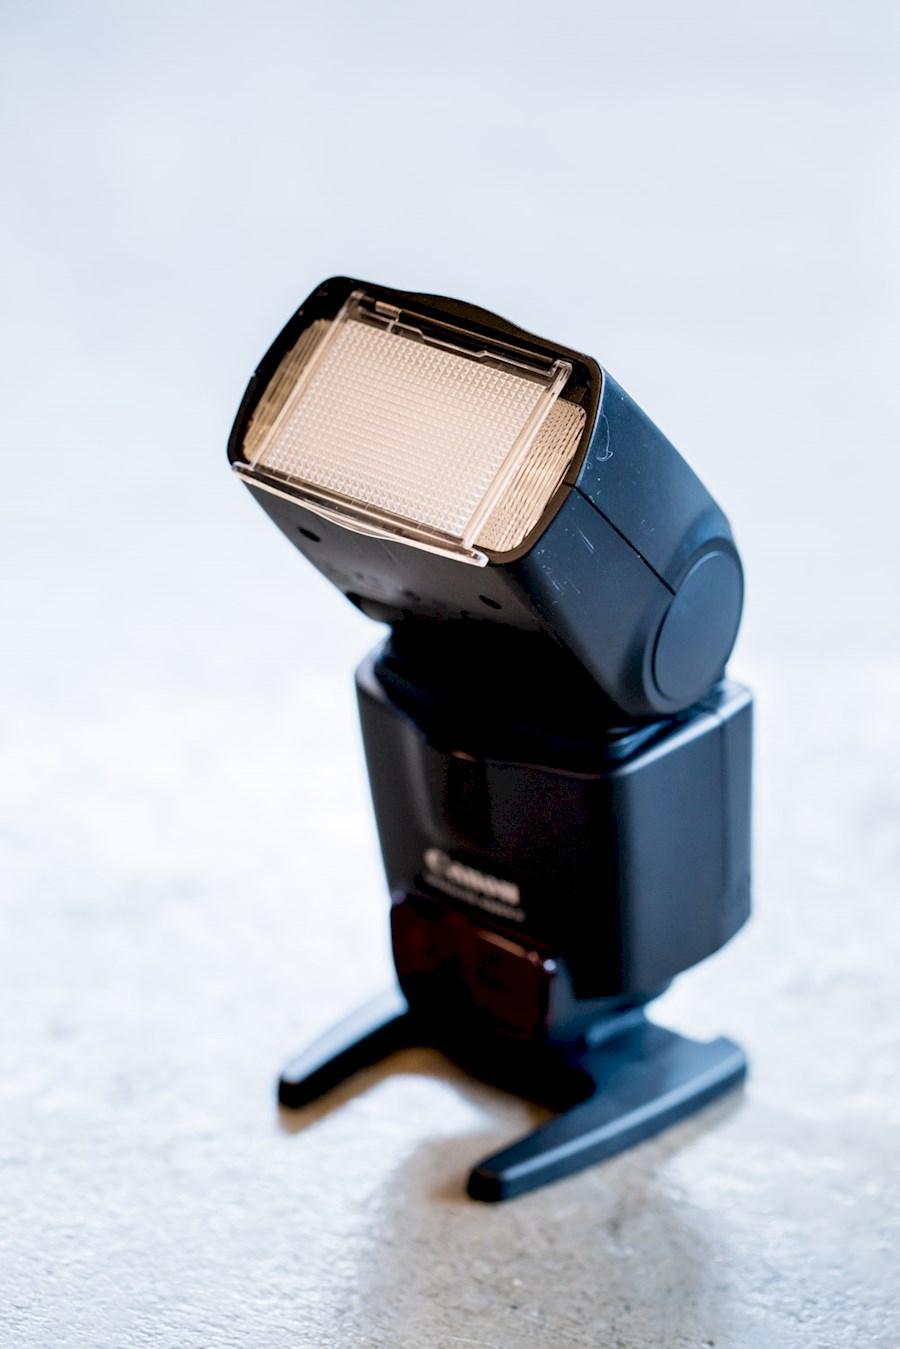 Rent a Canon Speedlite 430 EX2 flitser in Amsterdam from RISKE DE VRIES